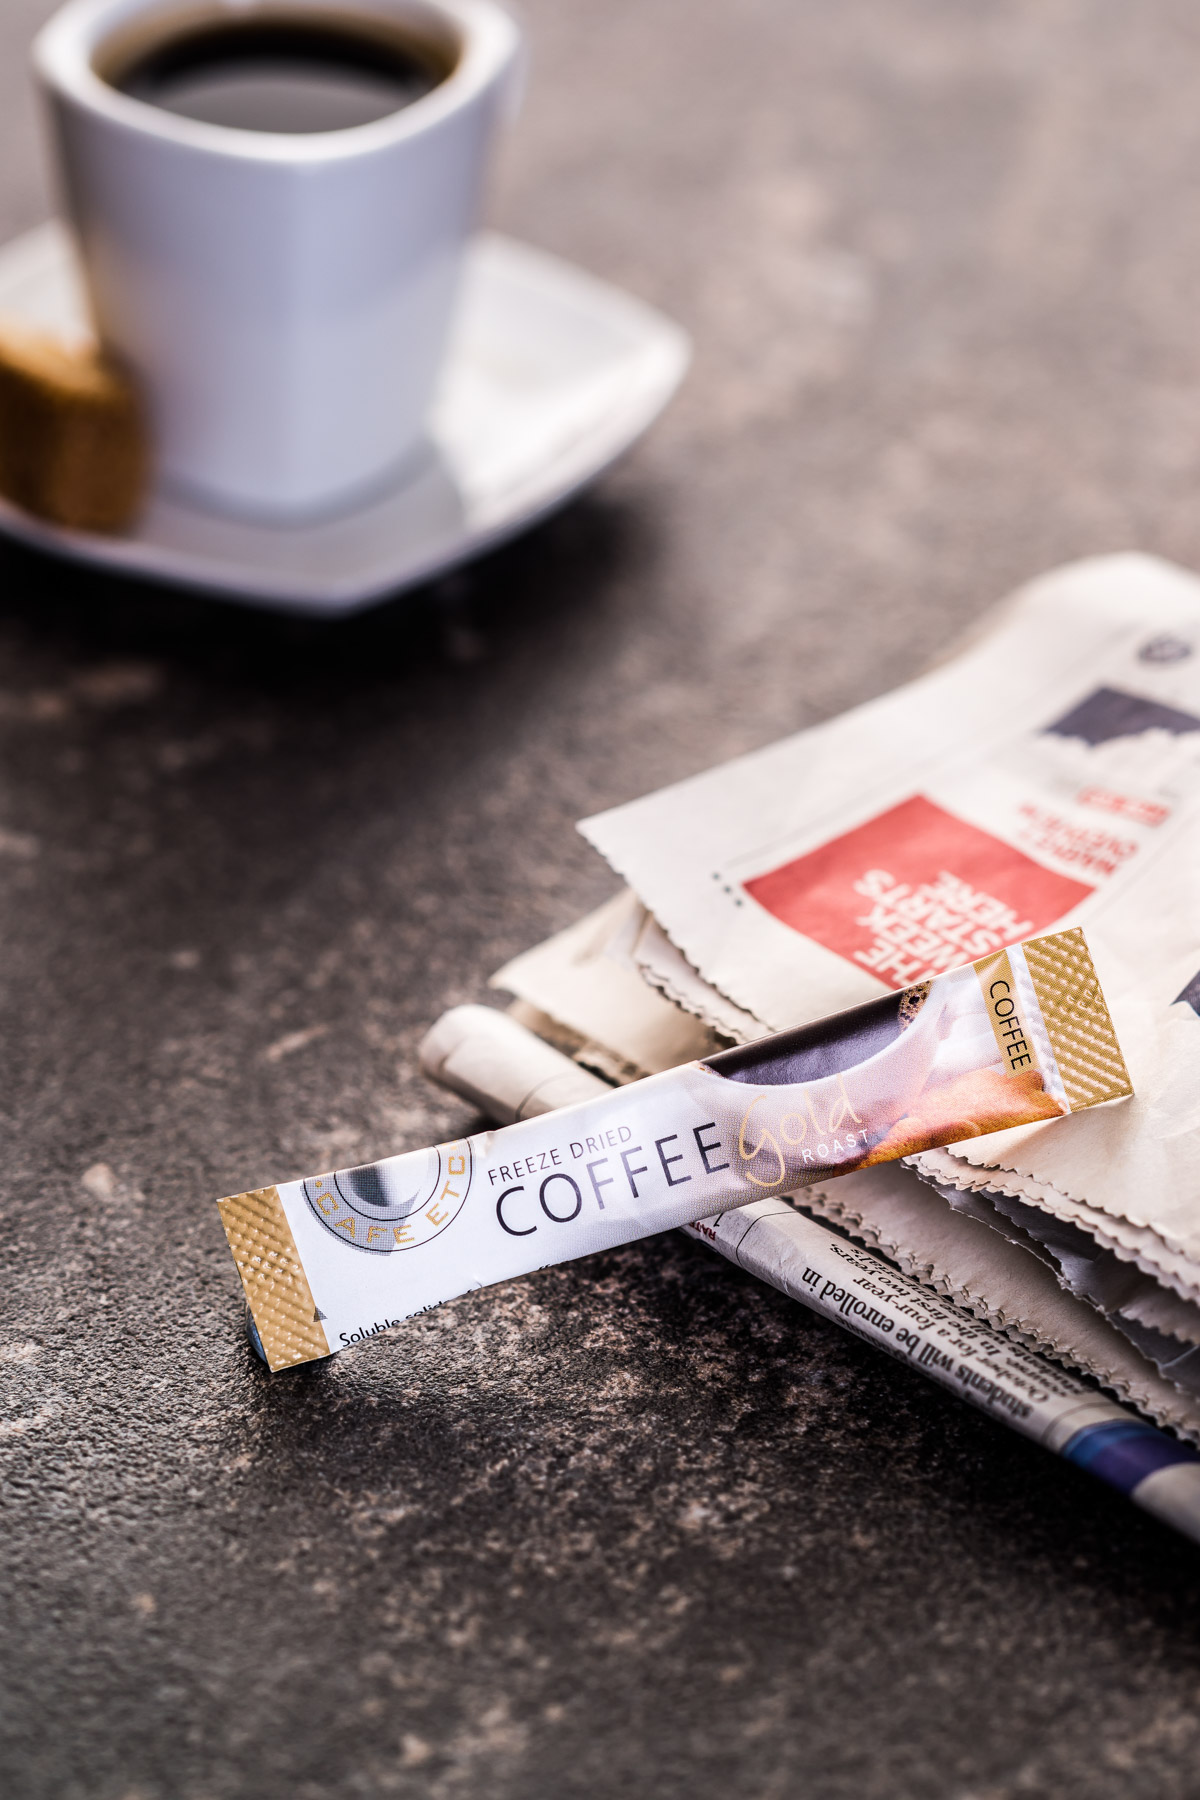 Cafe Etc